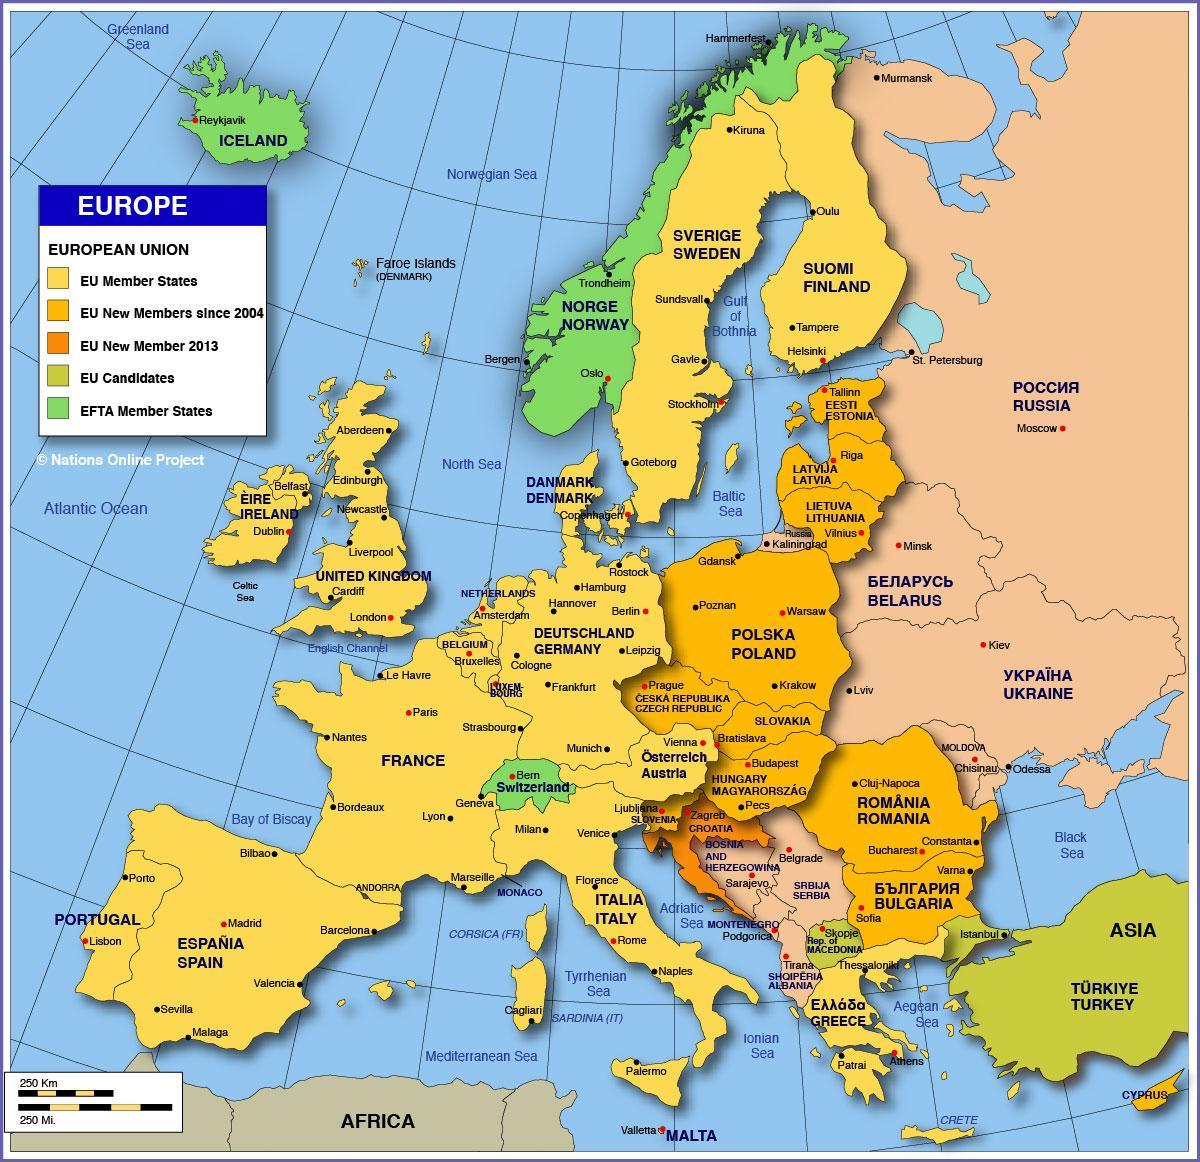 karta över europa map Moskva europa karta   Moskva på en karta över europa (Ryssland) karta över europa map